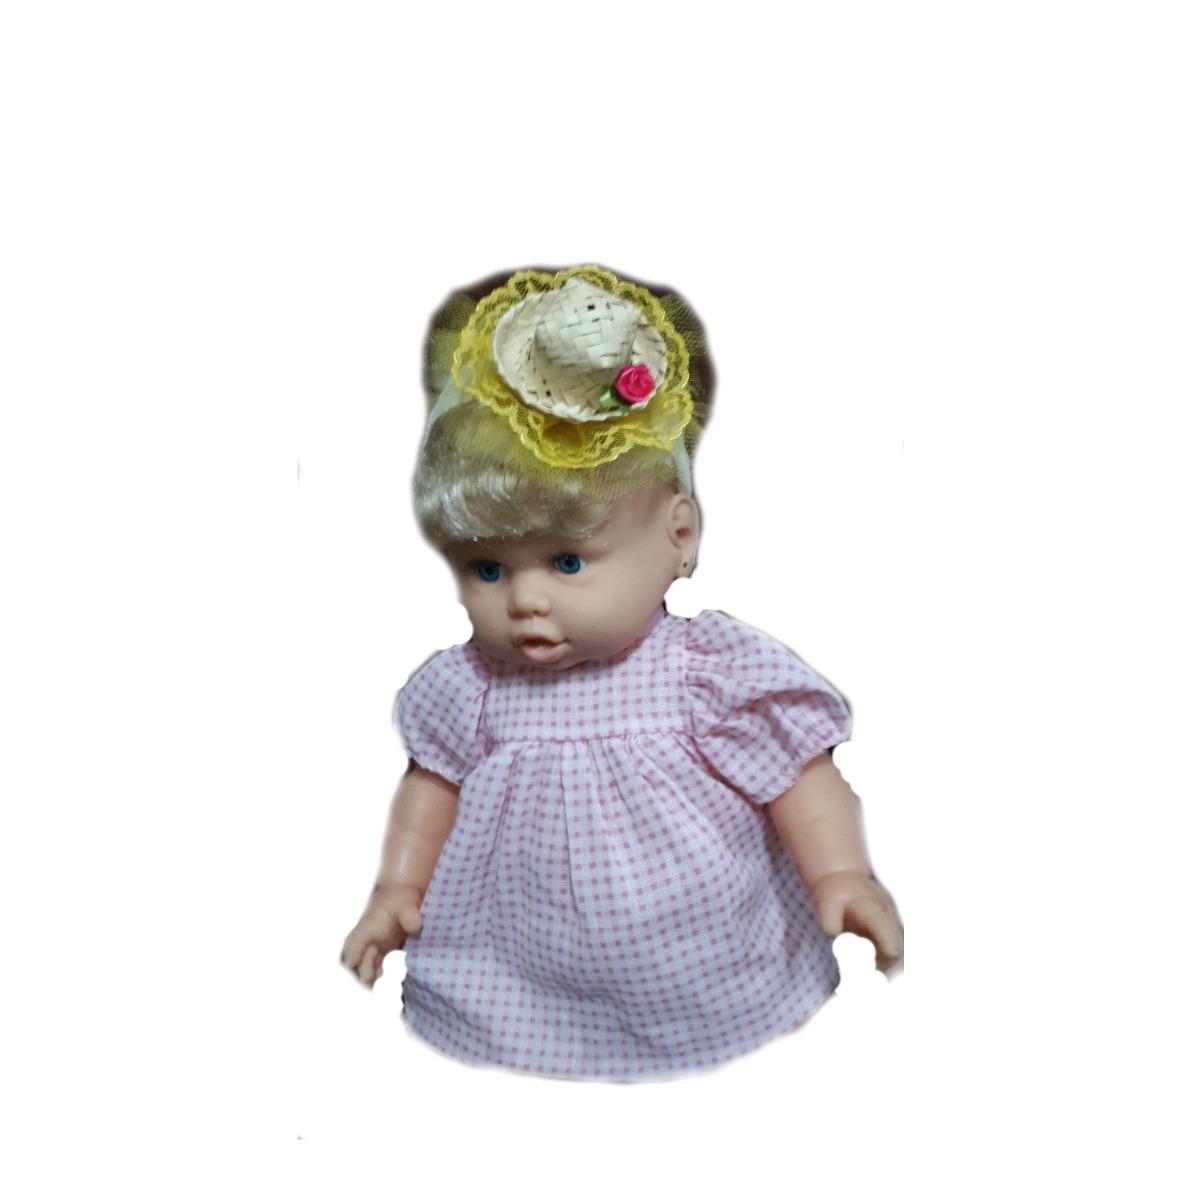 Faixa Cabelo Tiaras Laço Bebe Festa Junina Mini Chapéu Palha R 24